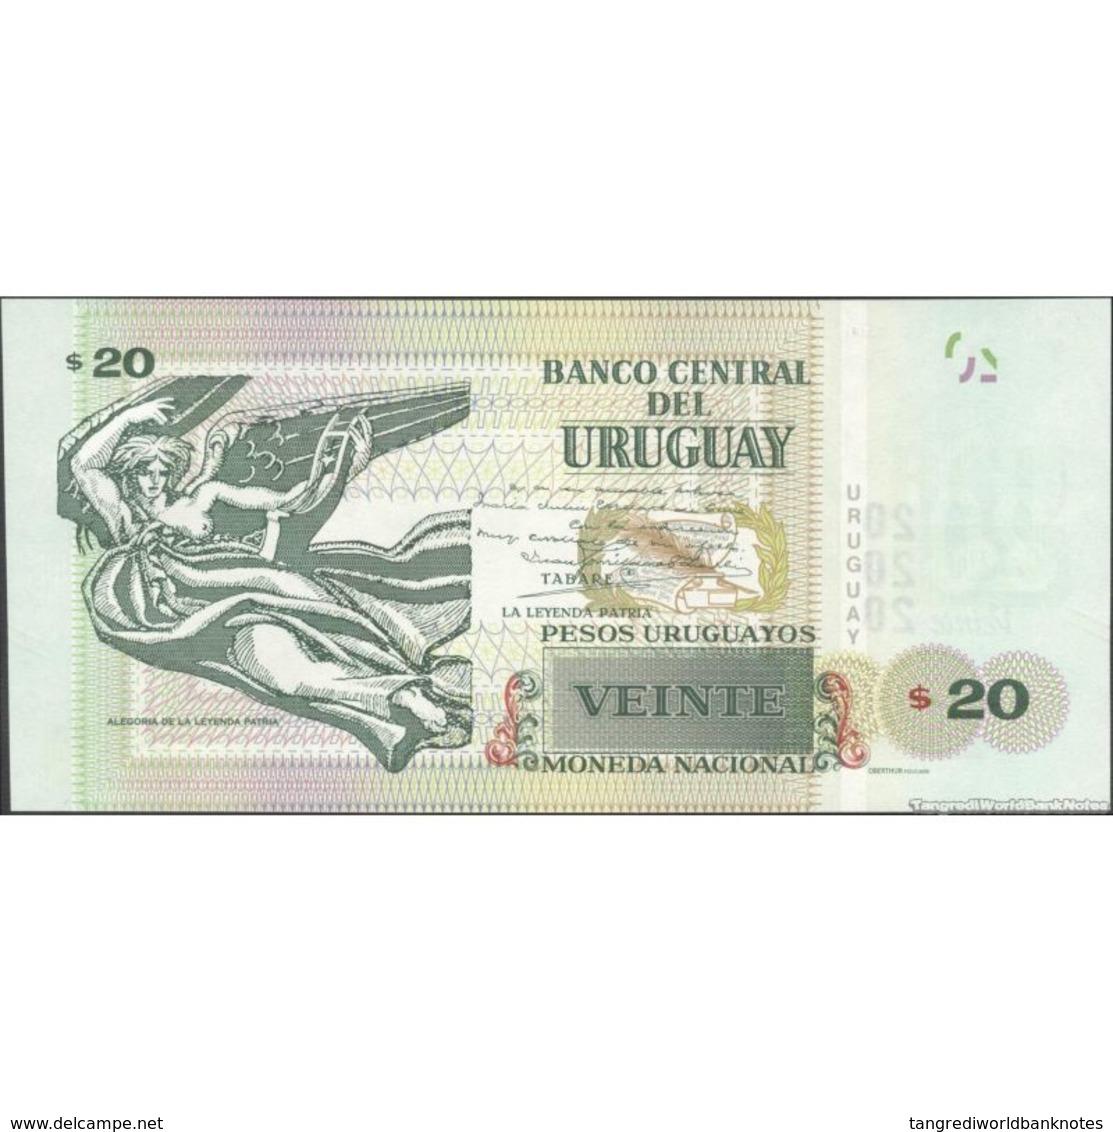 TWN - URUGUAY 93 - 20 Pesos Uruguayos 2015 (2017) Serie G UNC - Uruguay